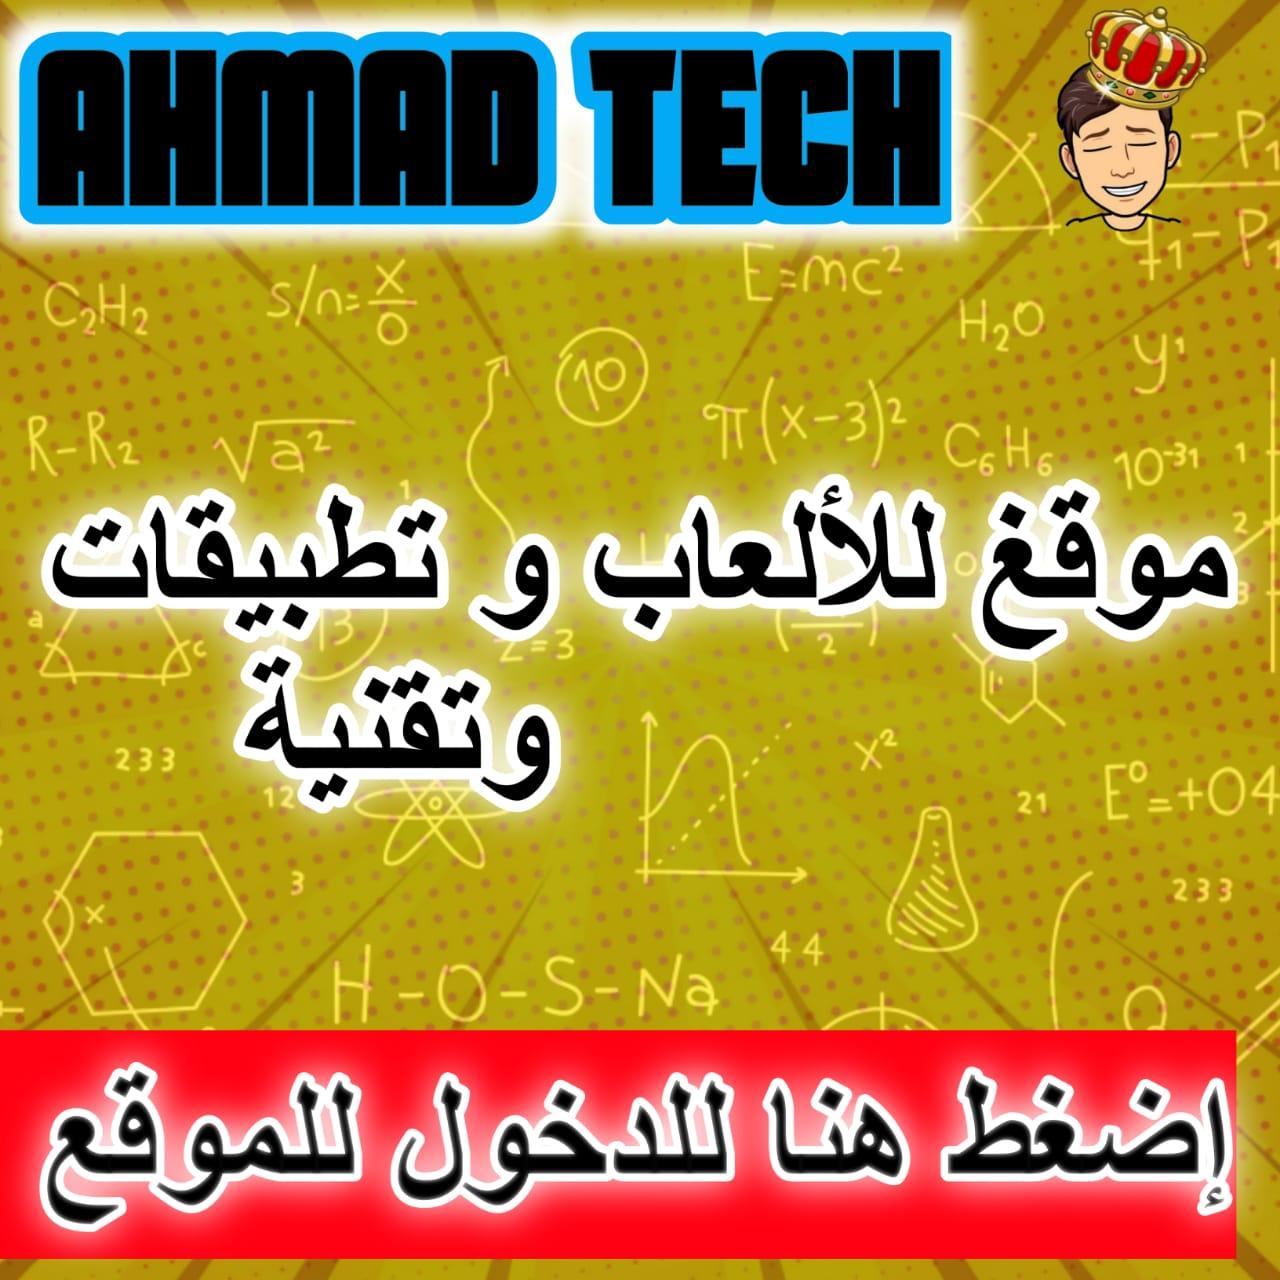 Ahmad tech